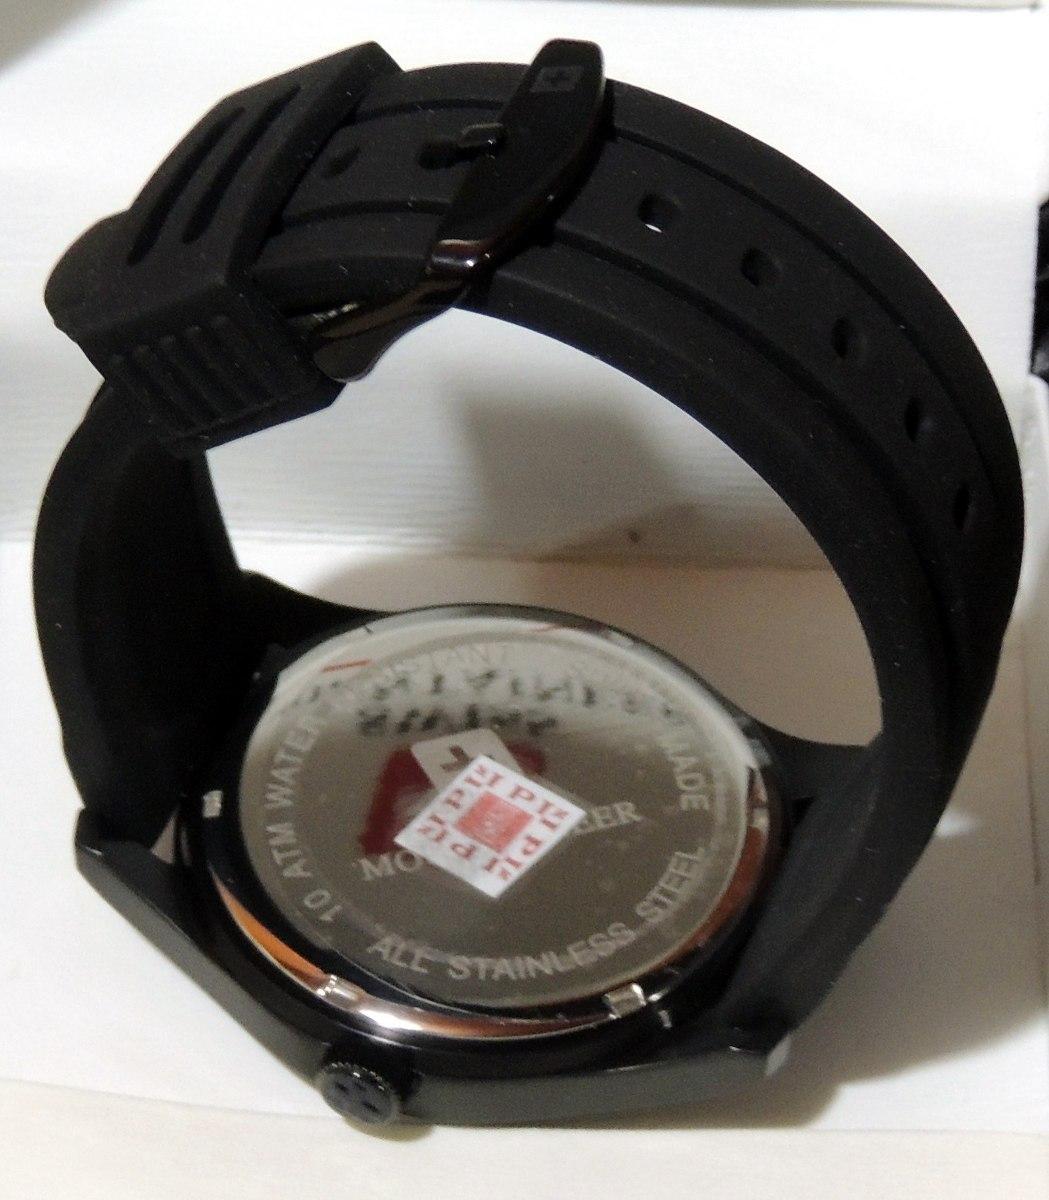 27c22a71a relogio suiço watch - swiss mountaineer - sml8041 - 48mm. Carregando zoom.